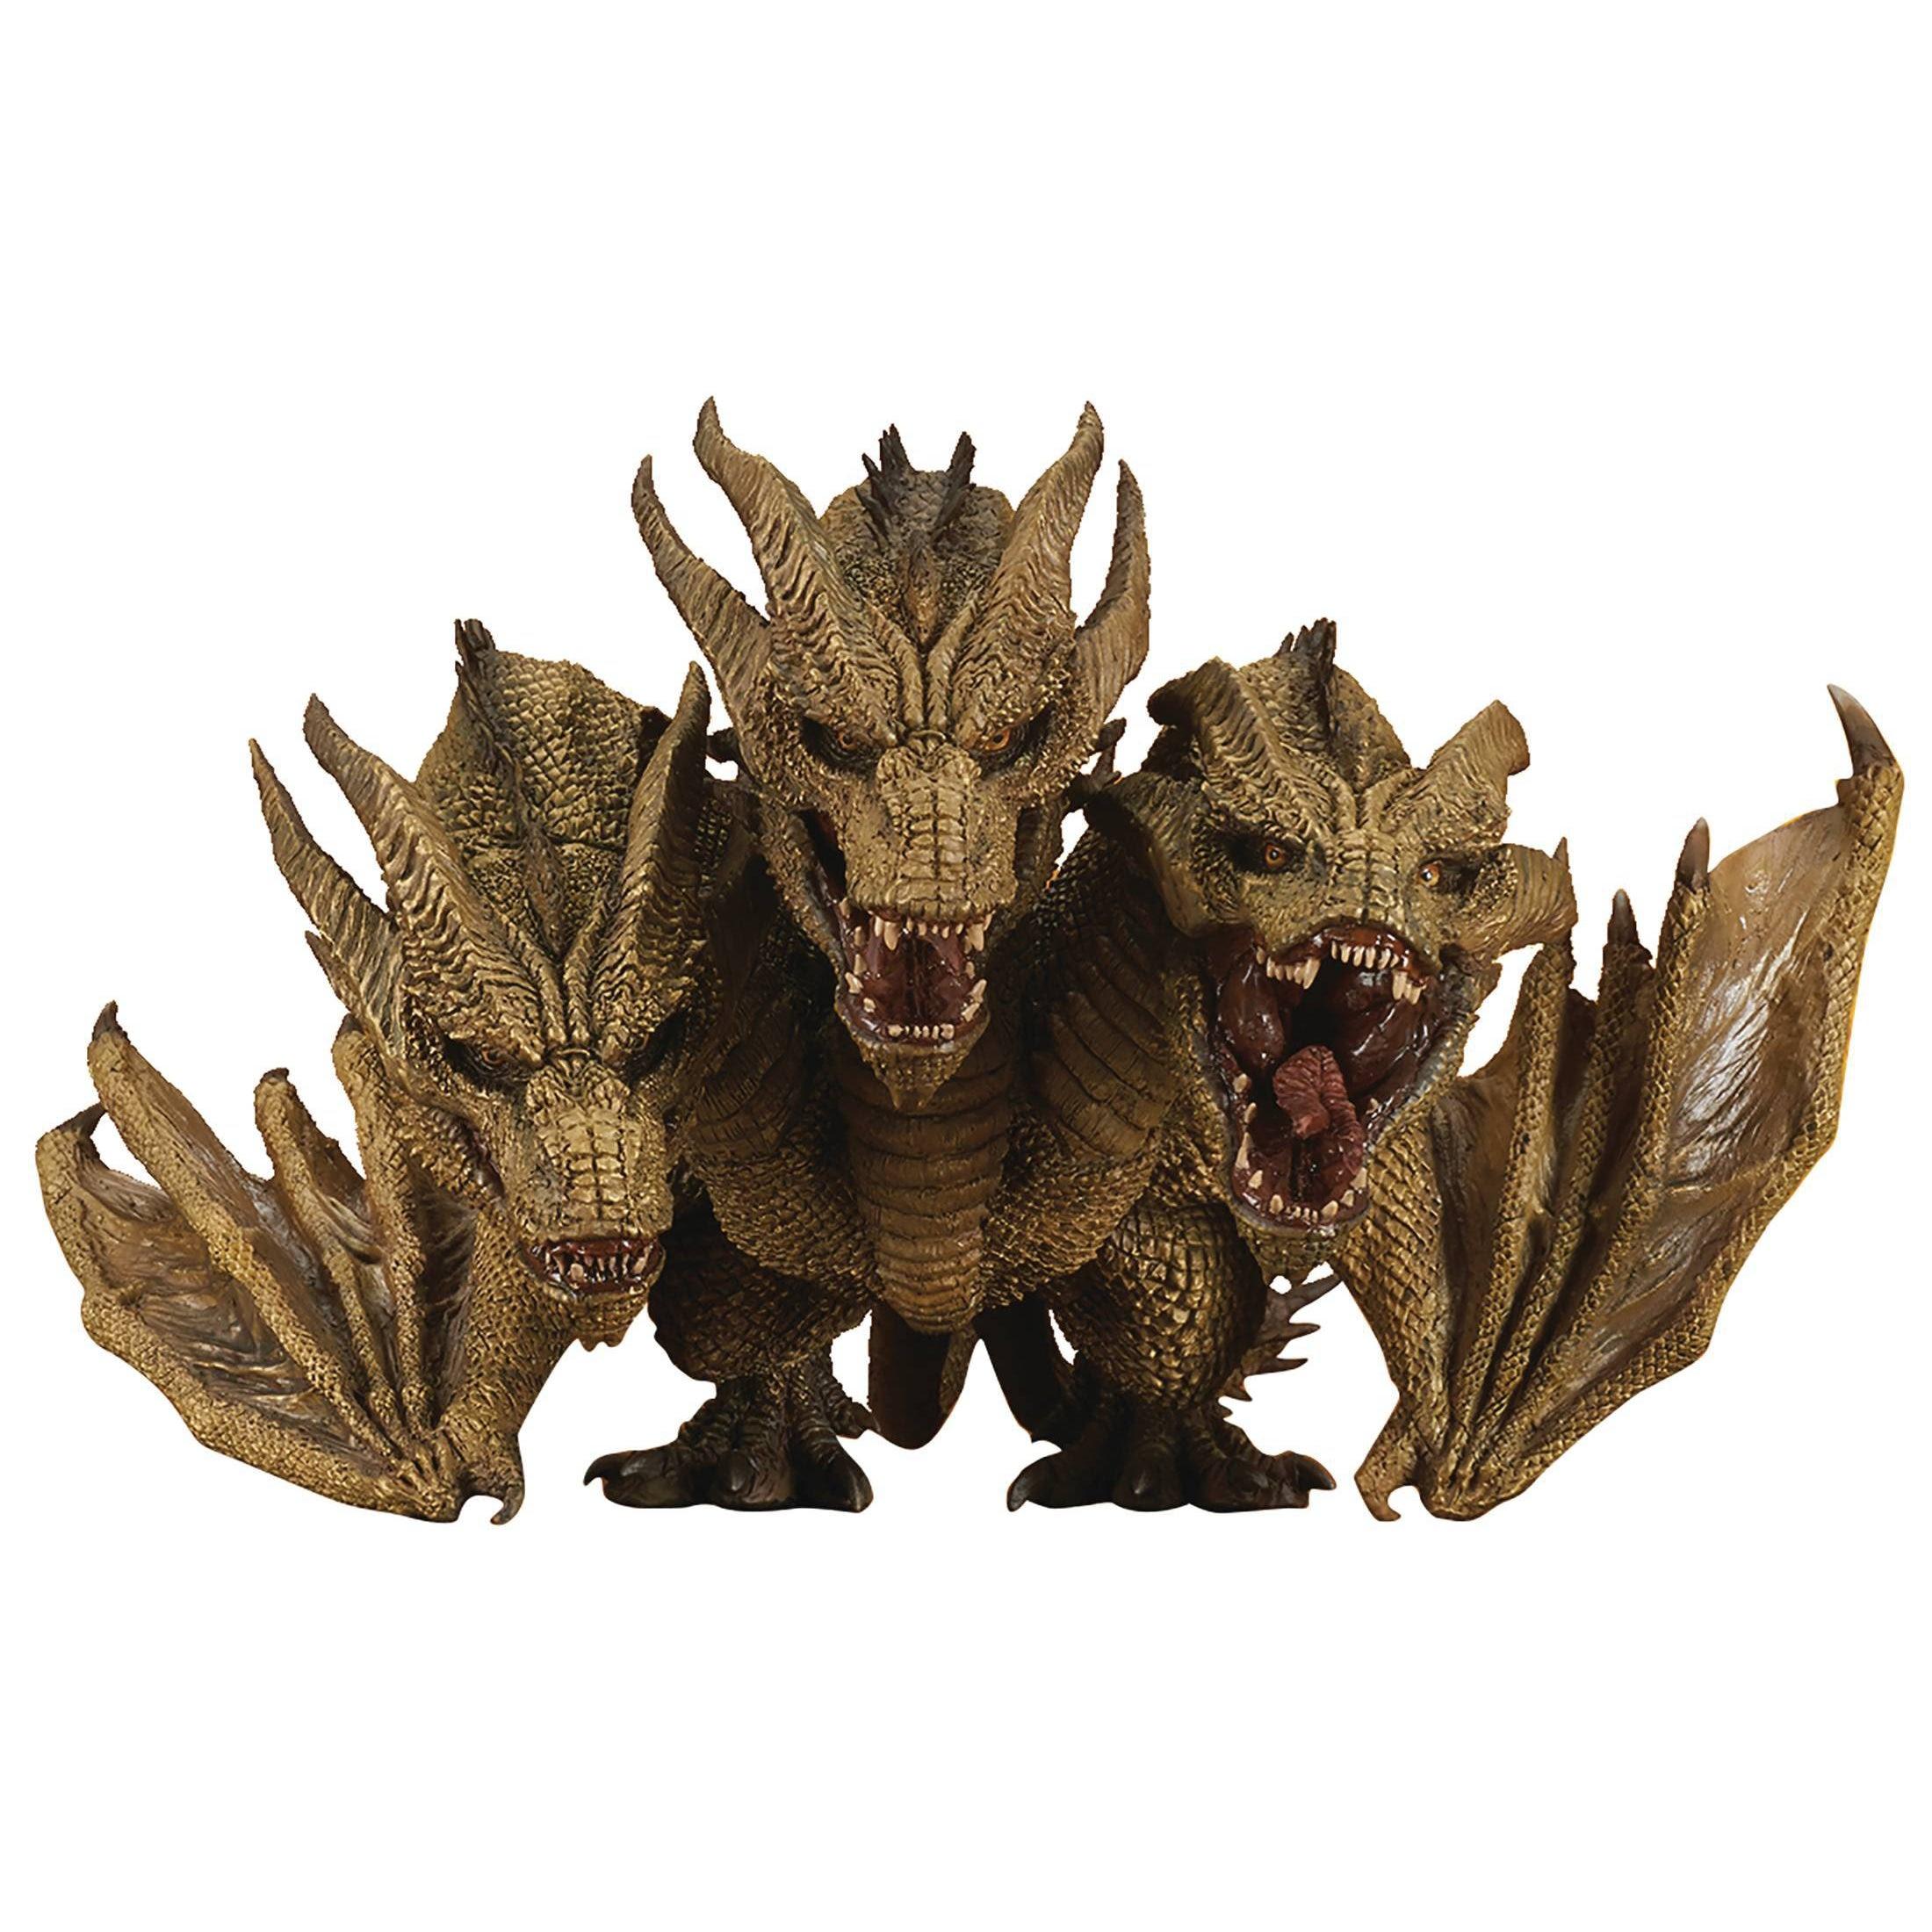 Image of Godzilla 2019 King Ghidorah Deforeal Soft Vinyl Statue - MARCH 2020